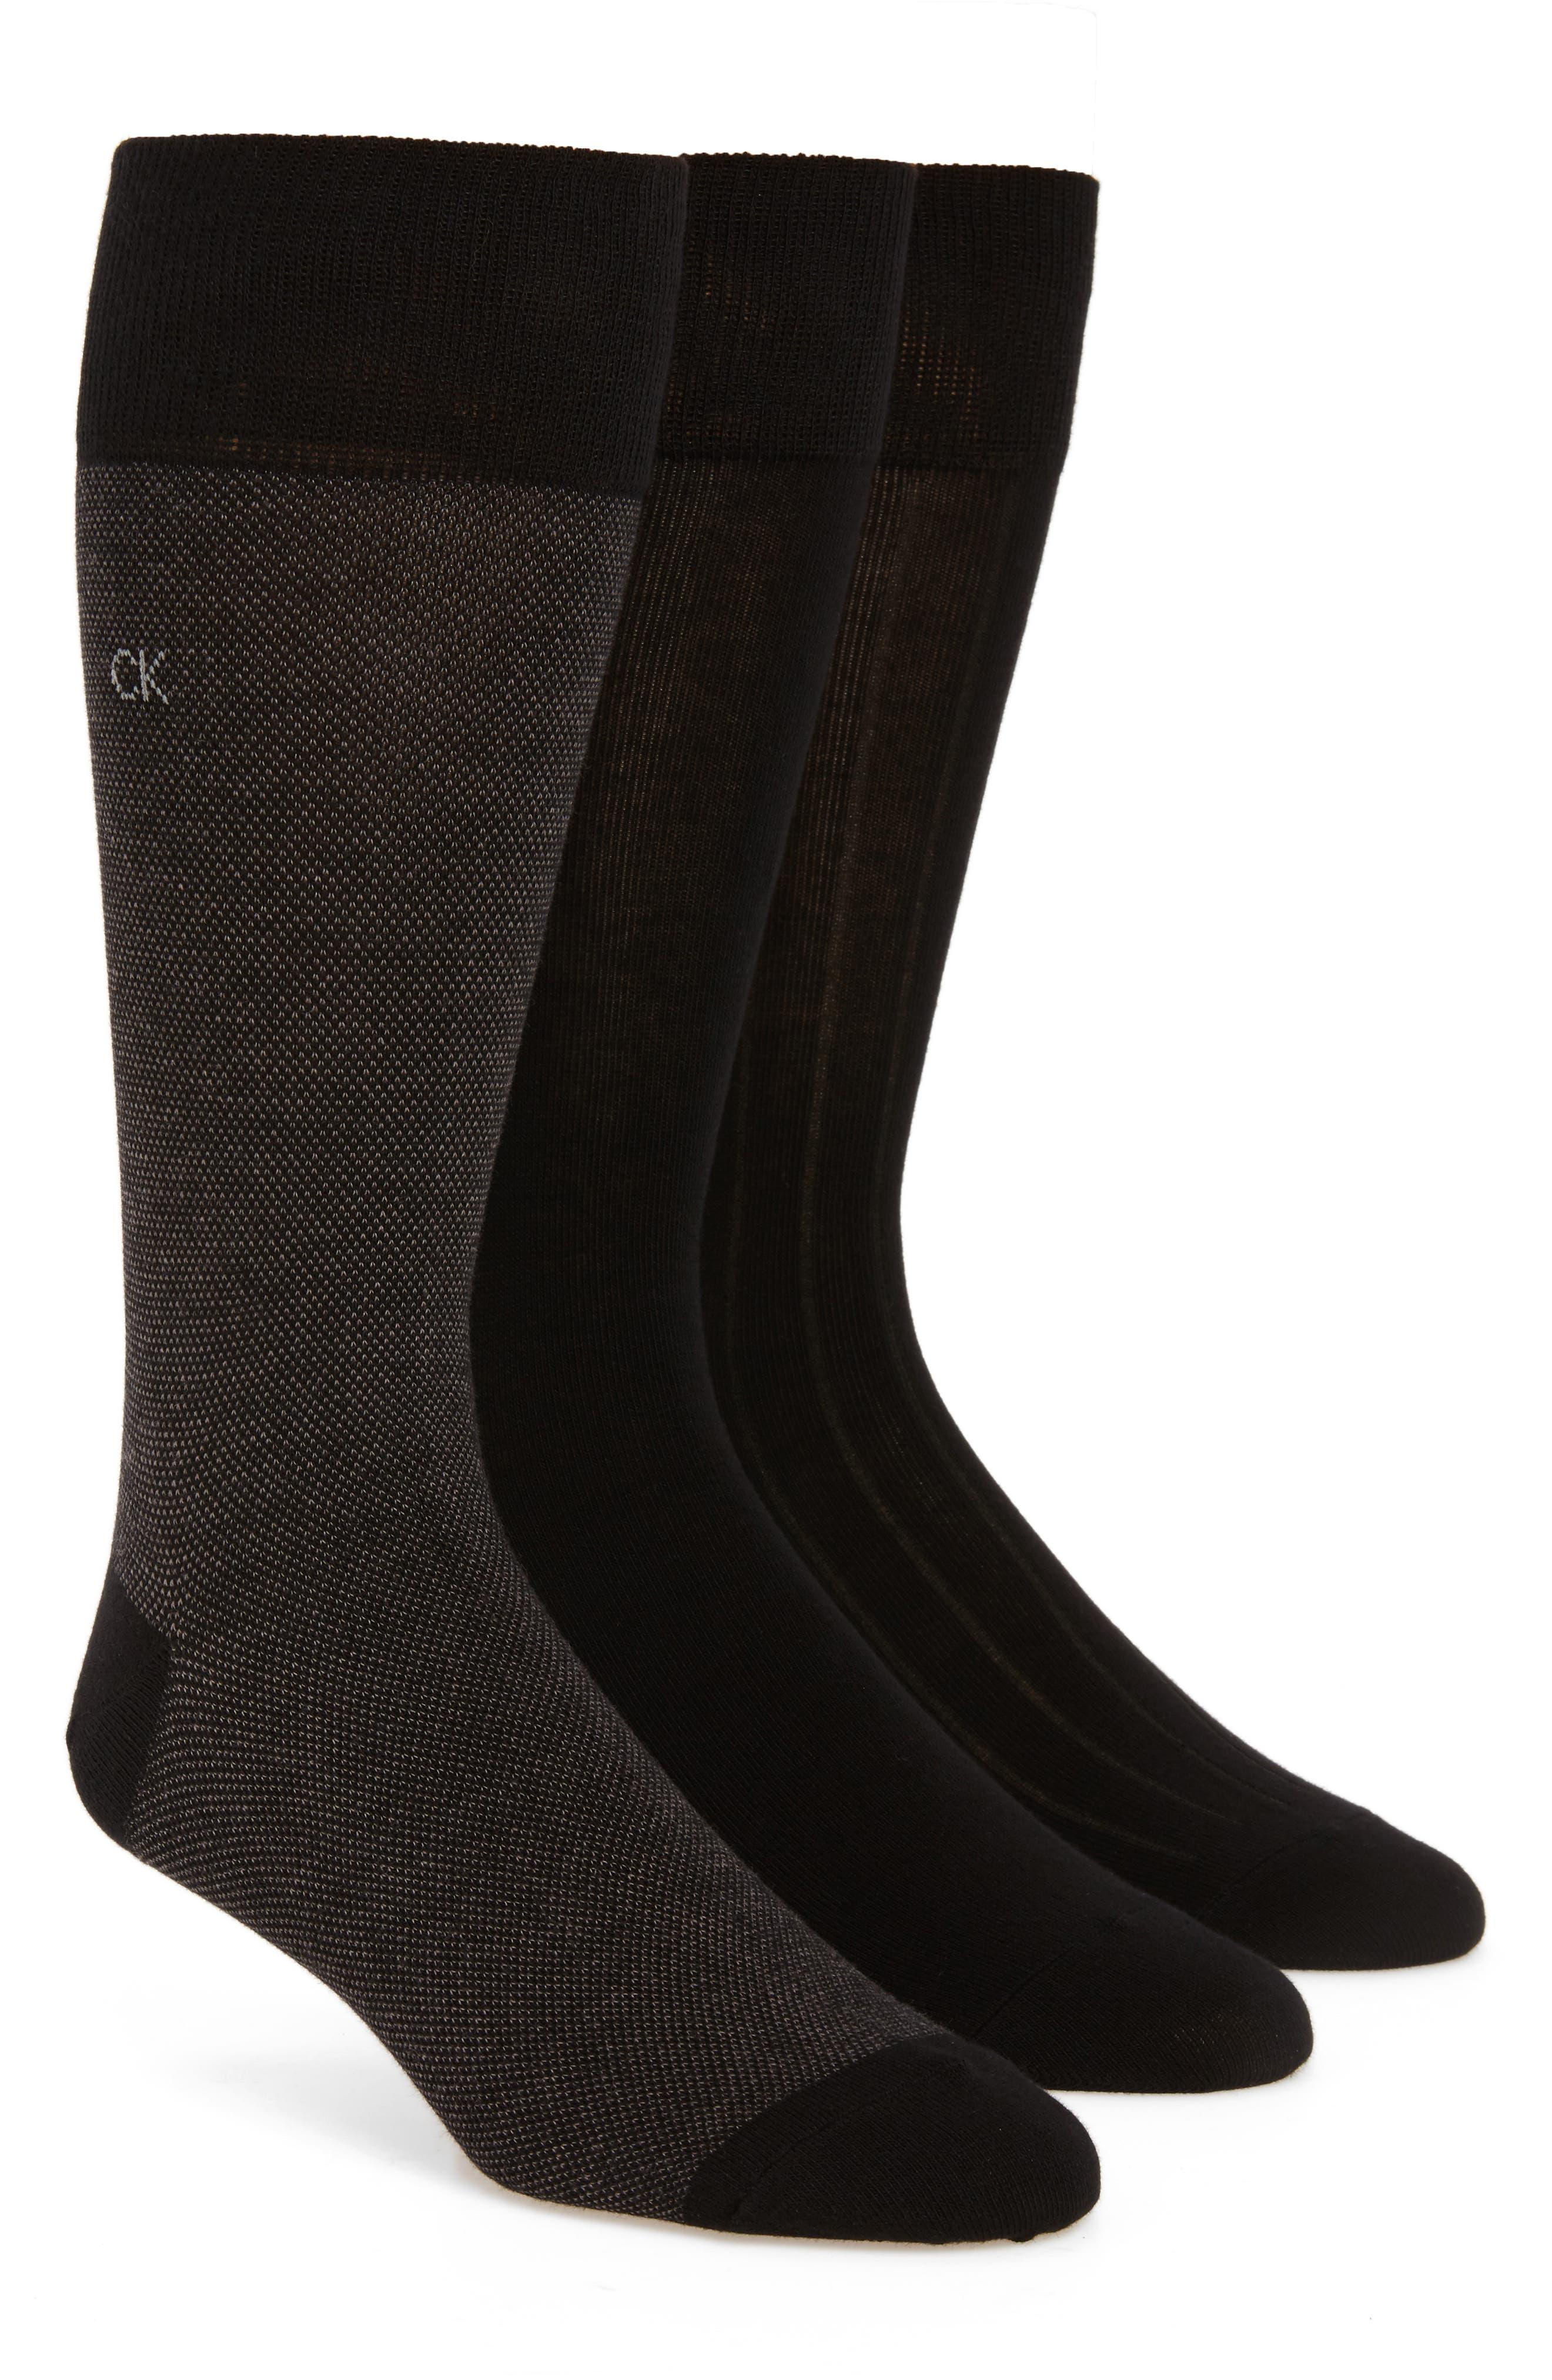 3-Pack Crew Socks,                             Main thumbnail 1, color,                             BLACK